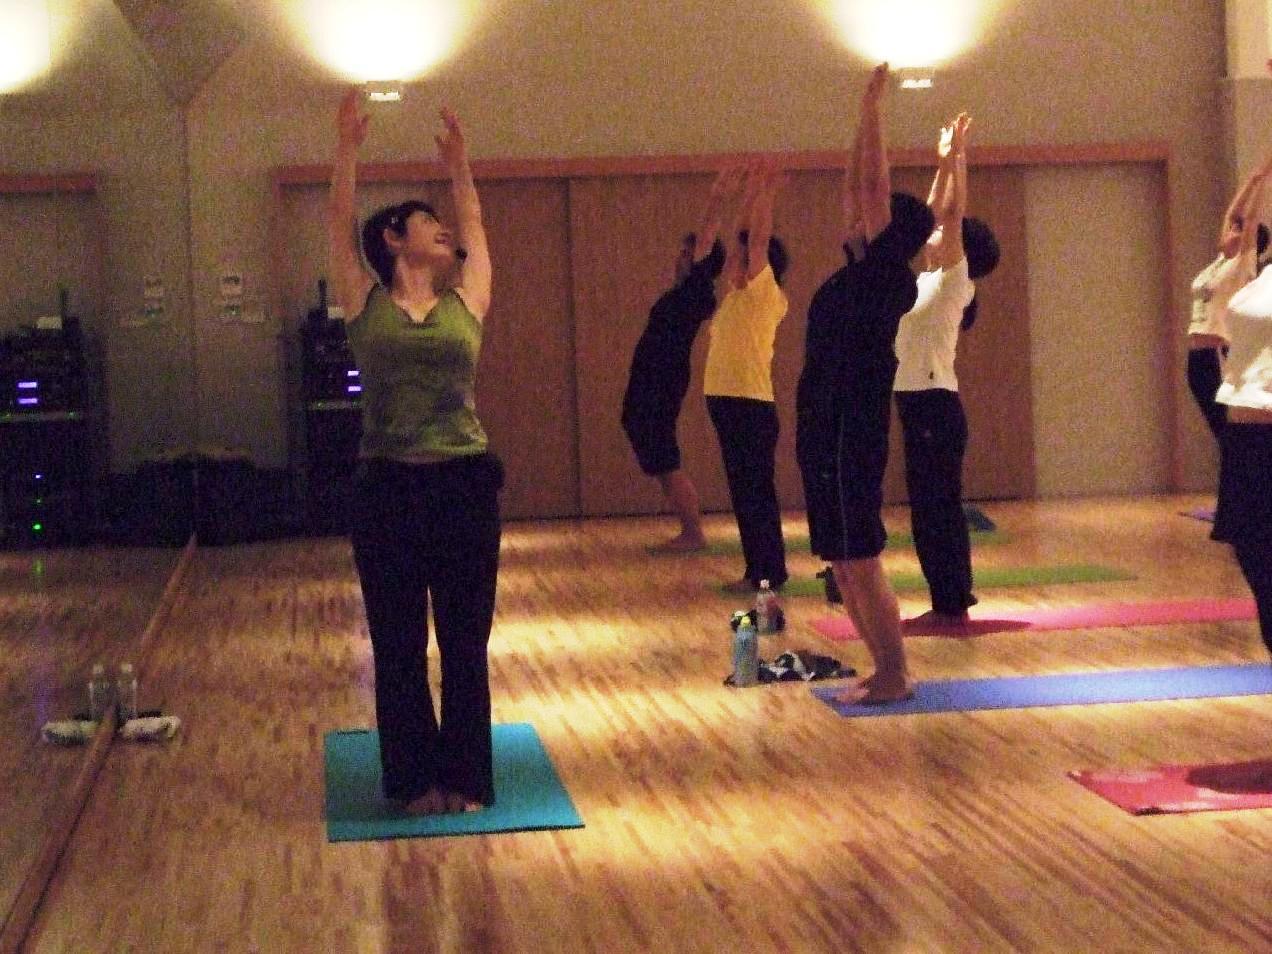 esty yoga(エスティヨガ) - 浜本(ハマモト)さんの写真